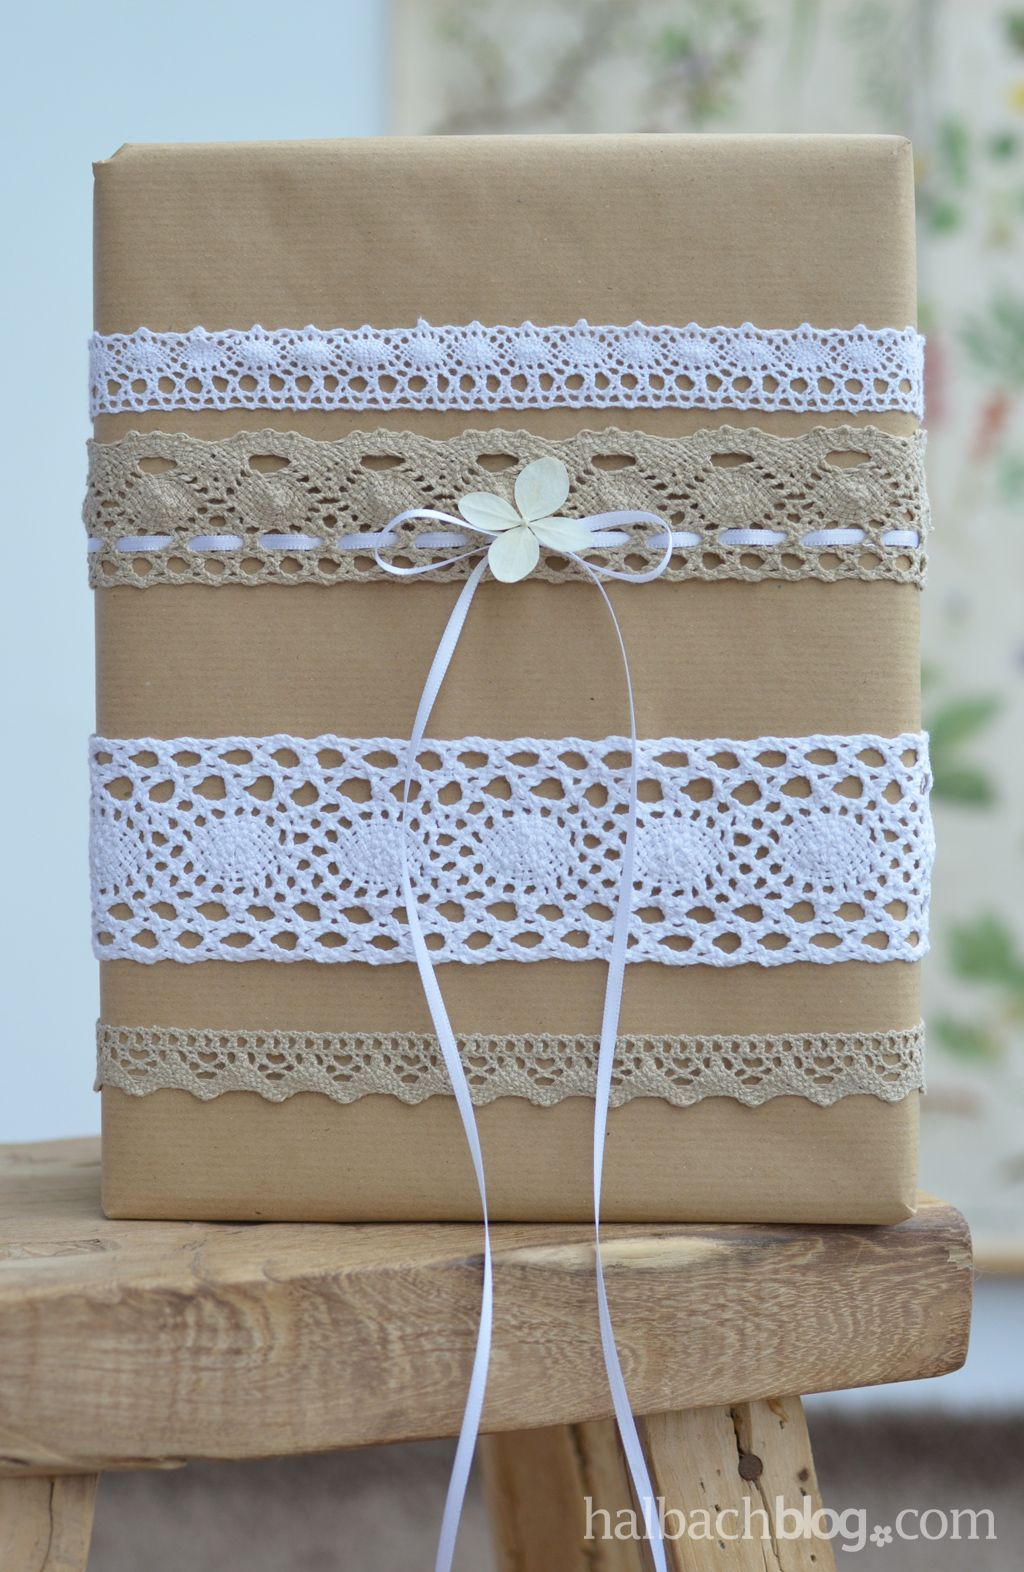 die besten 25 geschenke verpacken packpapier ideen auf. Black Bedroom Furniture Sets. Home Design Ideas